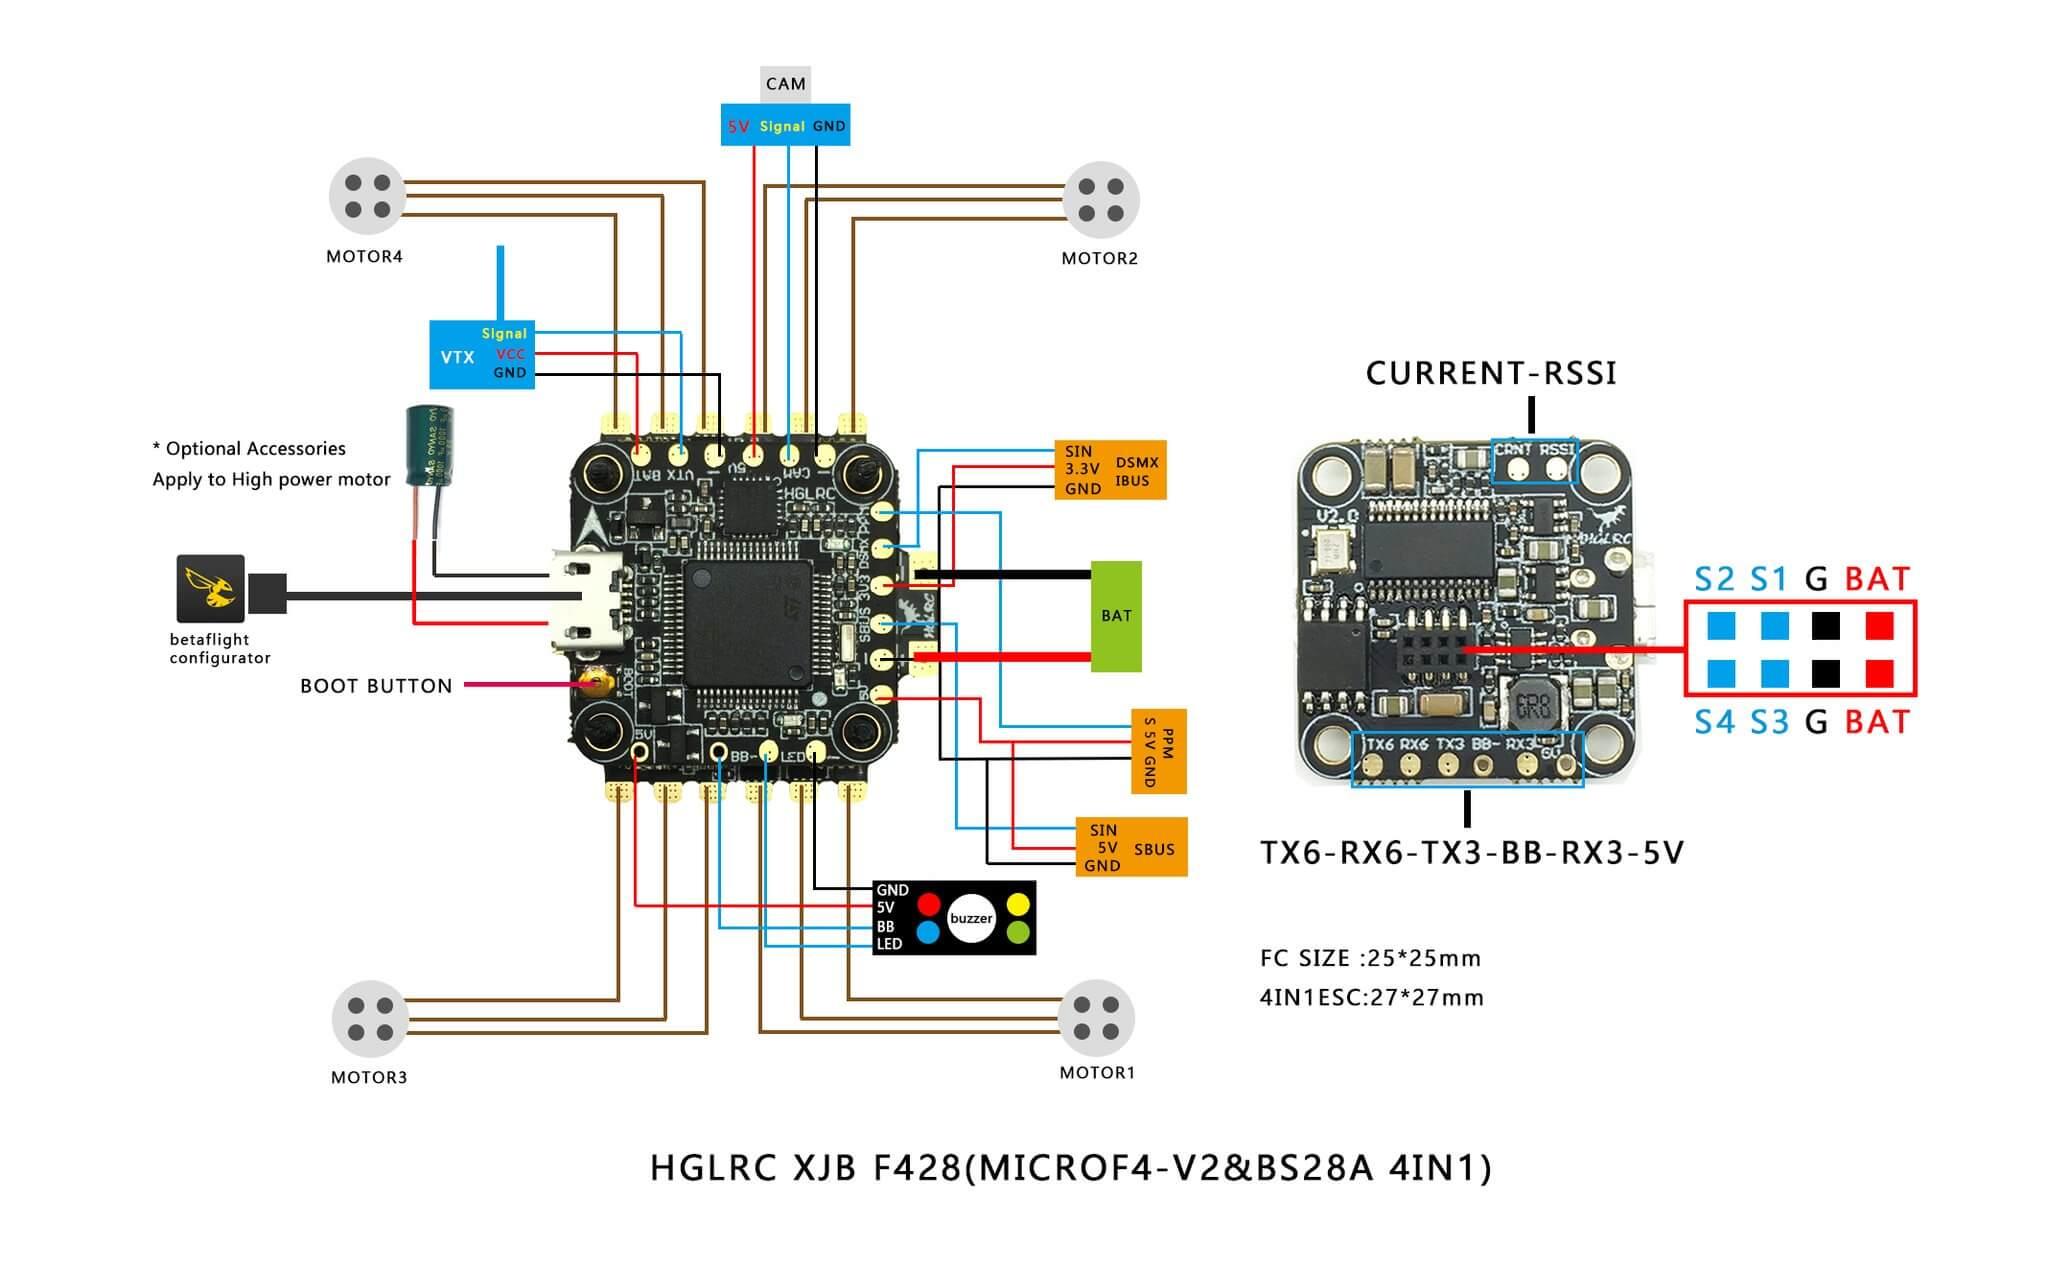 Sposob podlaczenia FC + ESC HGLRC XJB F428 V2 + BS28A